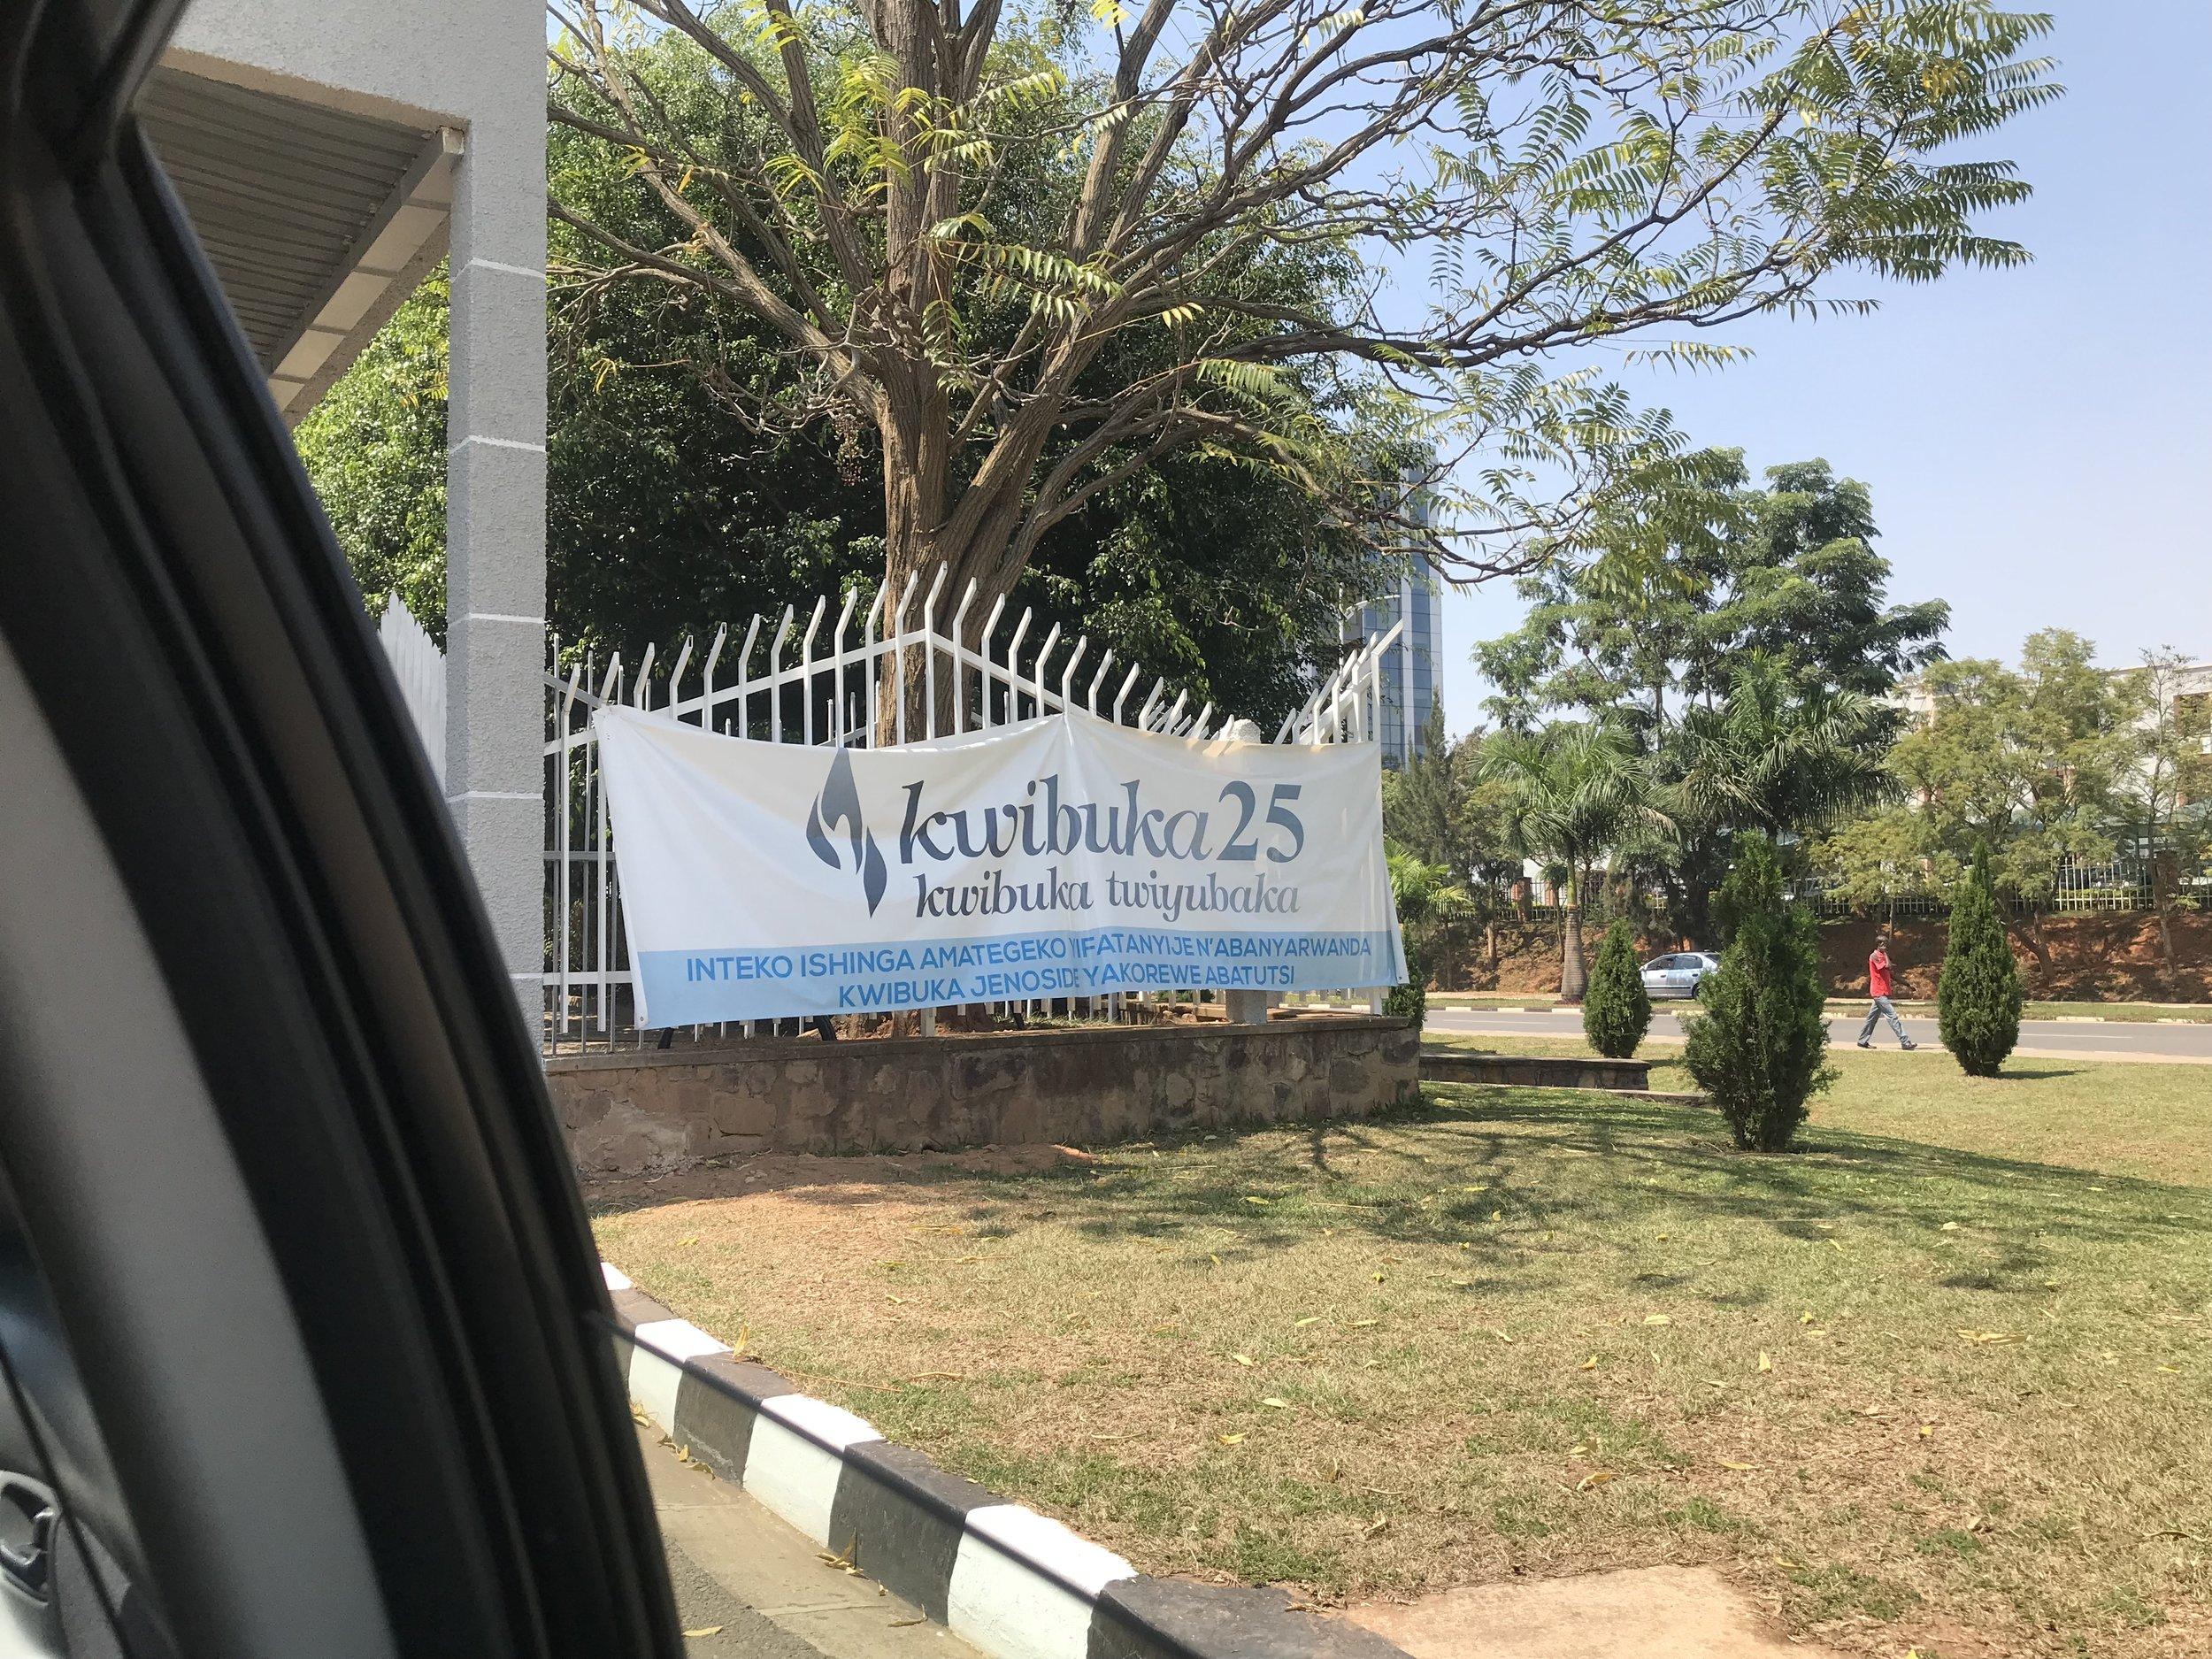 IMG_5590 2VickieRemoe-travel-kigali-rwanda-review-kwibohora25-hotels-africa.JPG